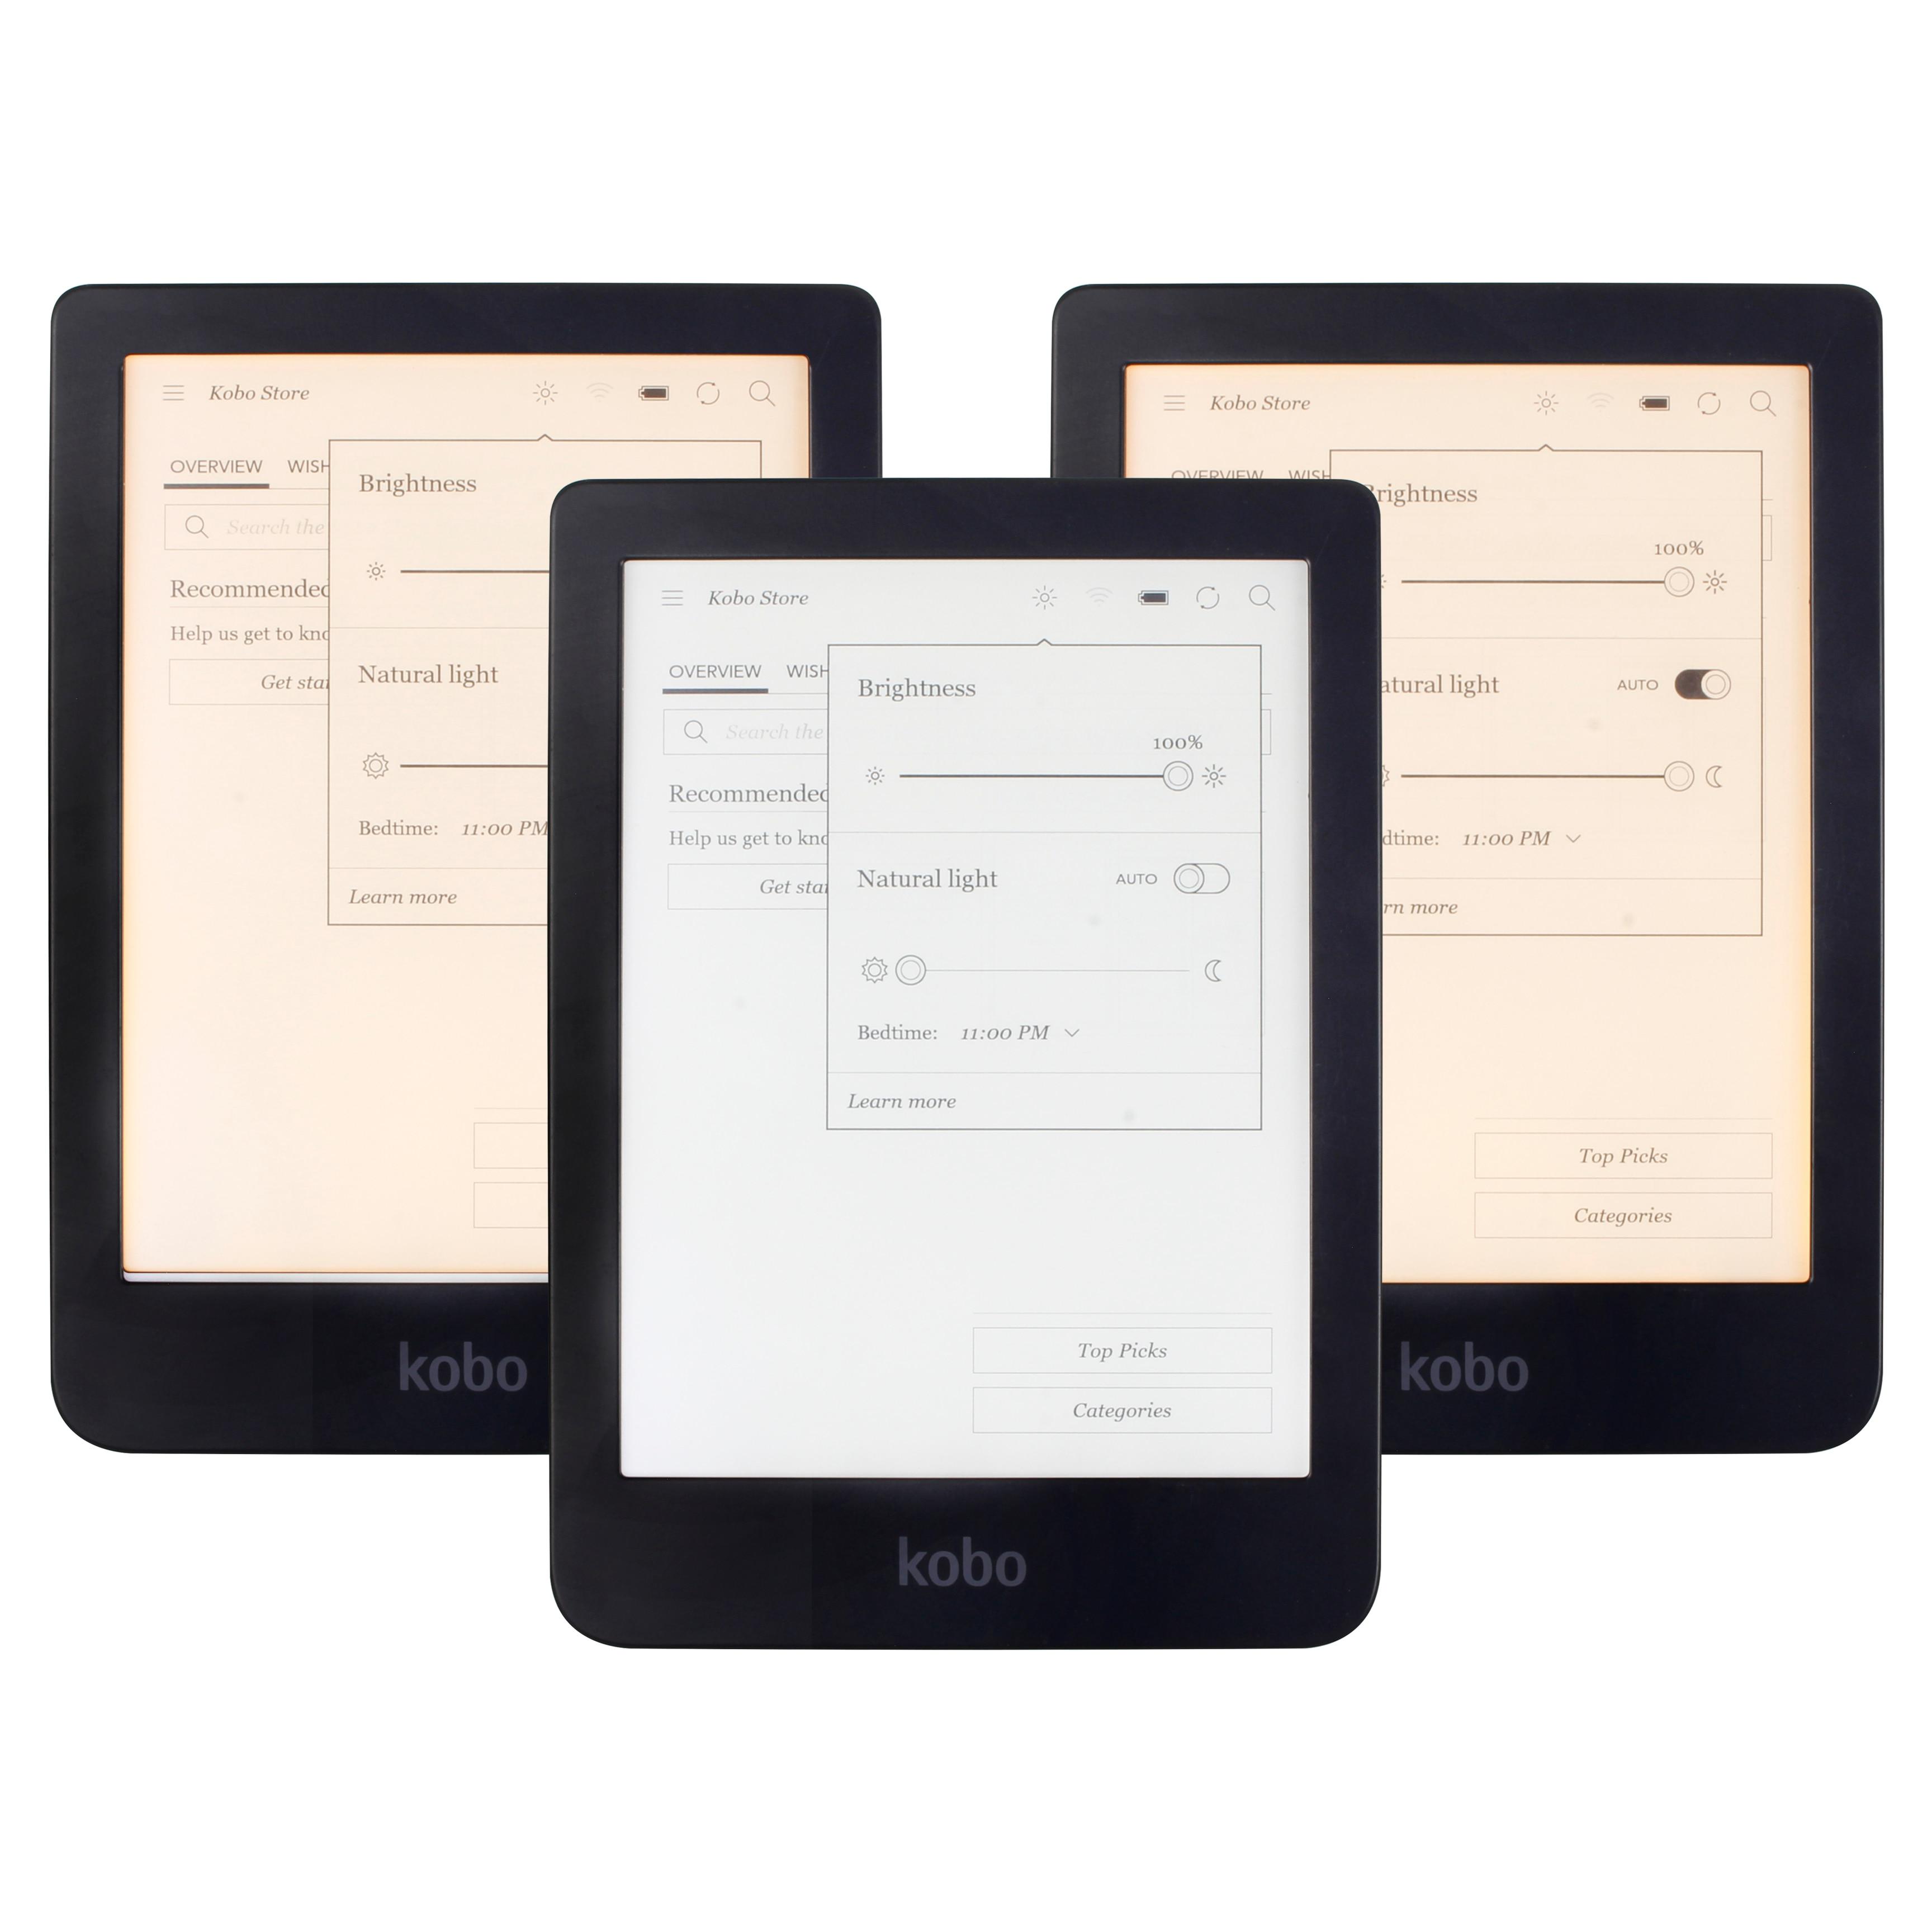 KOBO Clara HD N249 читалка сенсорный экран чтения электронных книг e-ink спереди светильник электронные книги ридер белый/теплый белый светильник